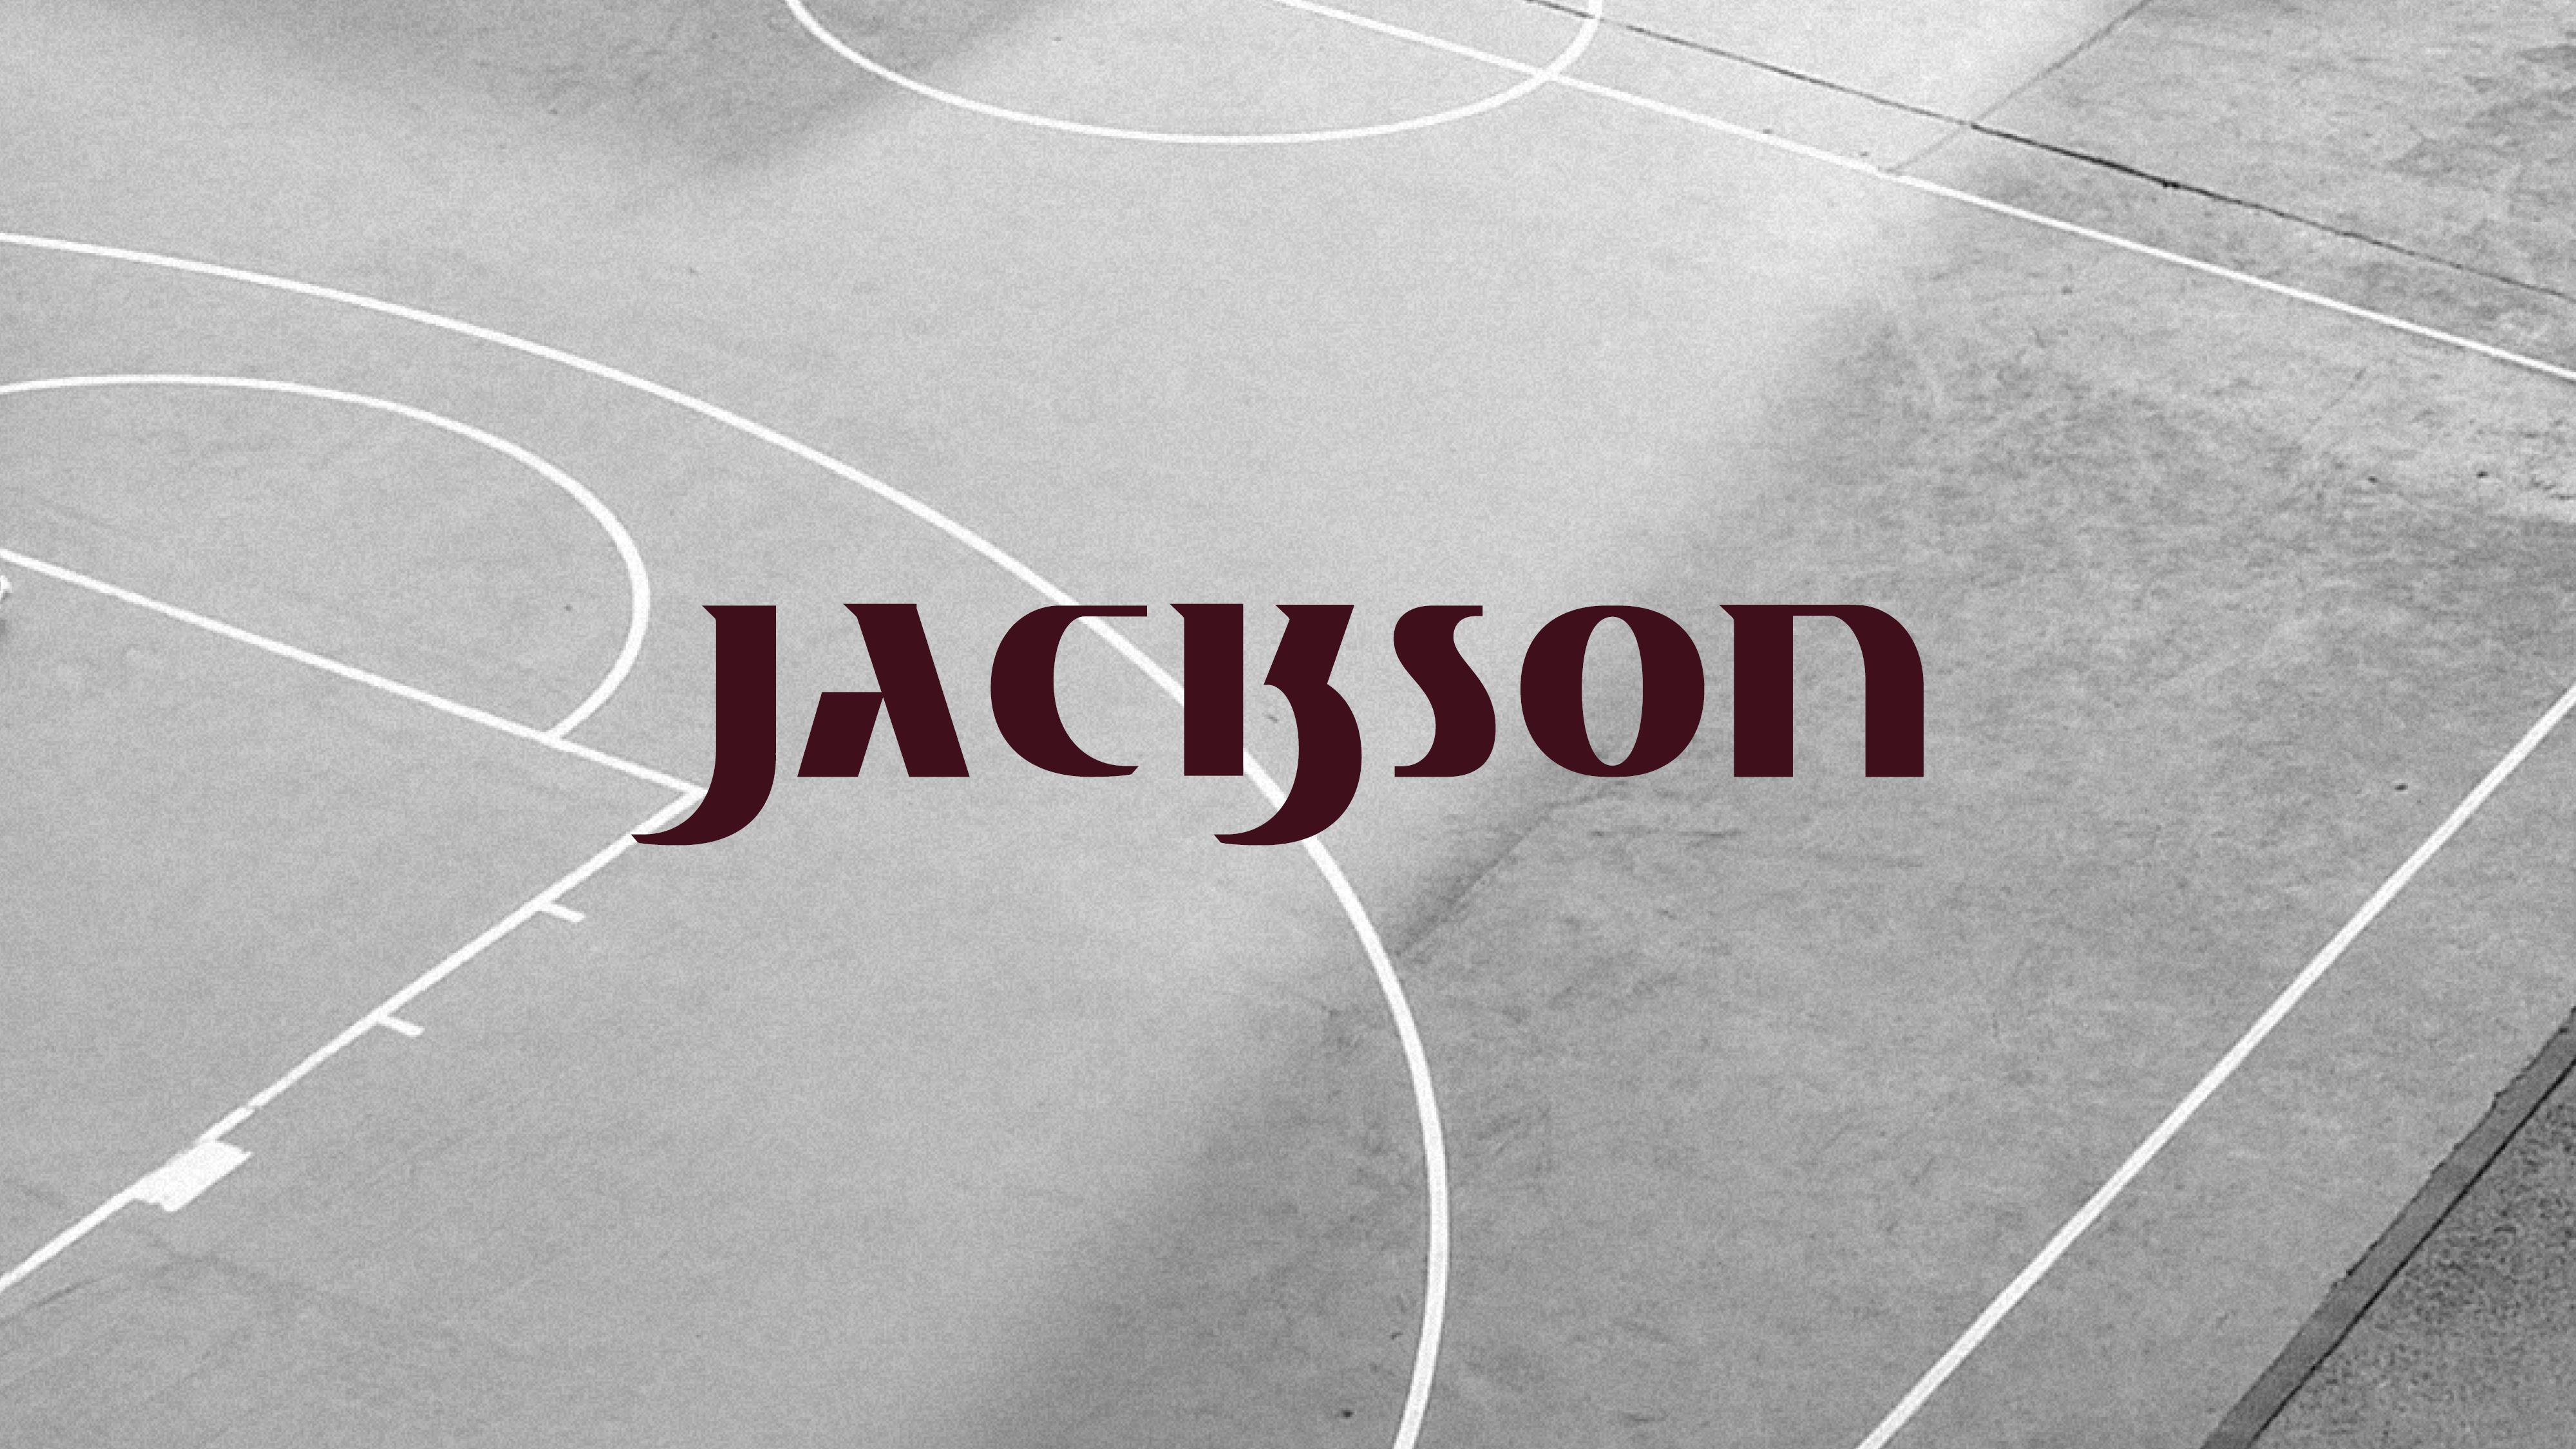 JPG Behance Jackson 1322